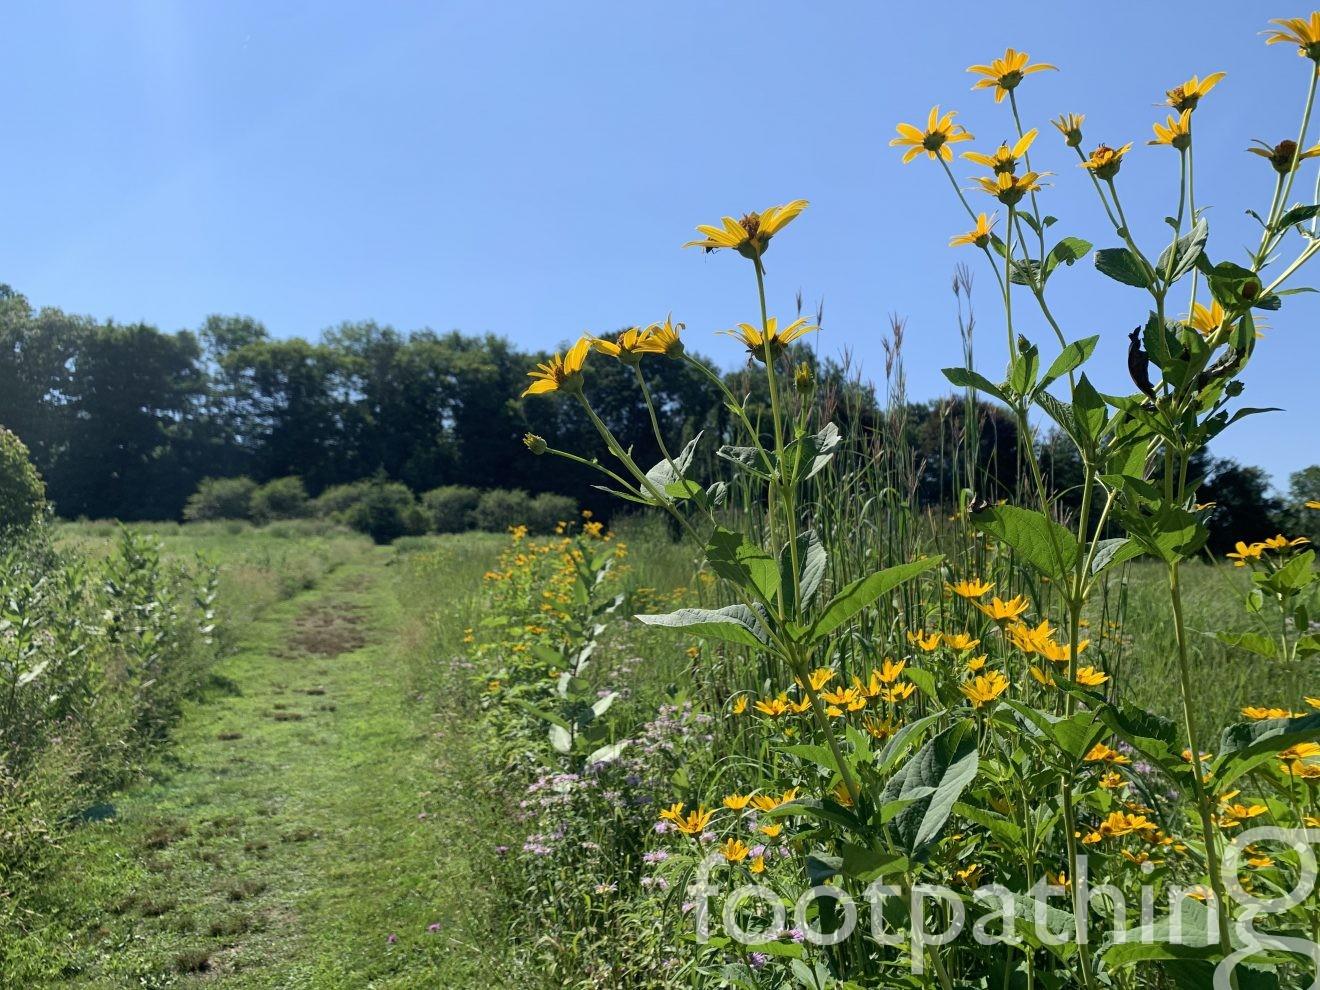 Greenway Meadows